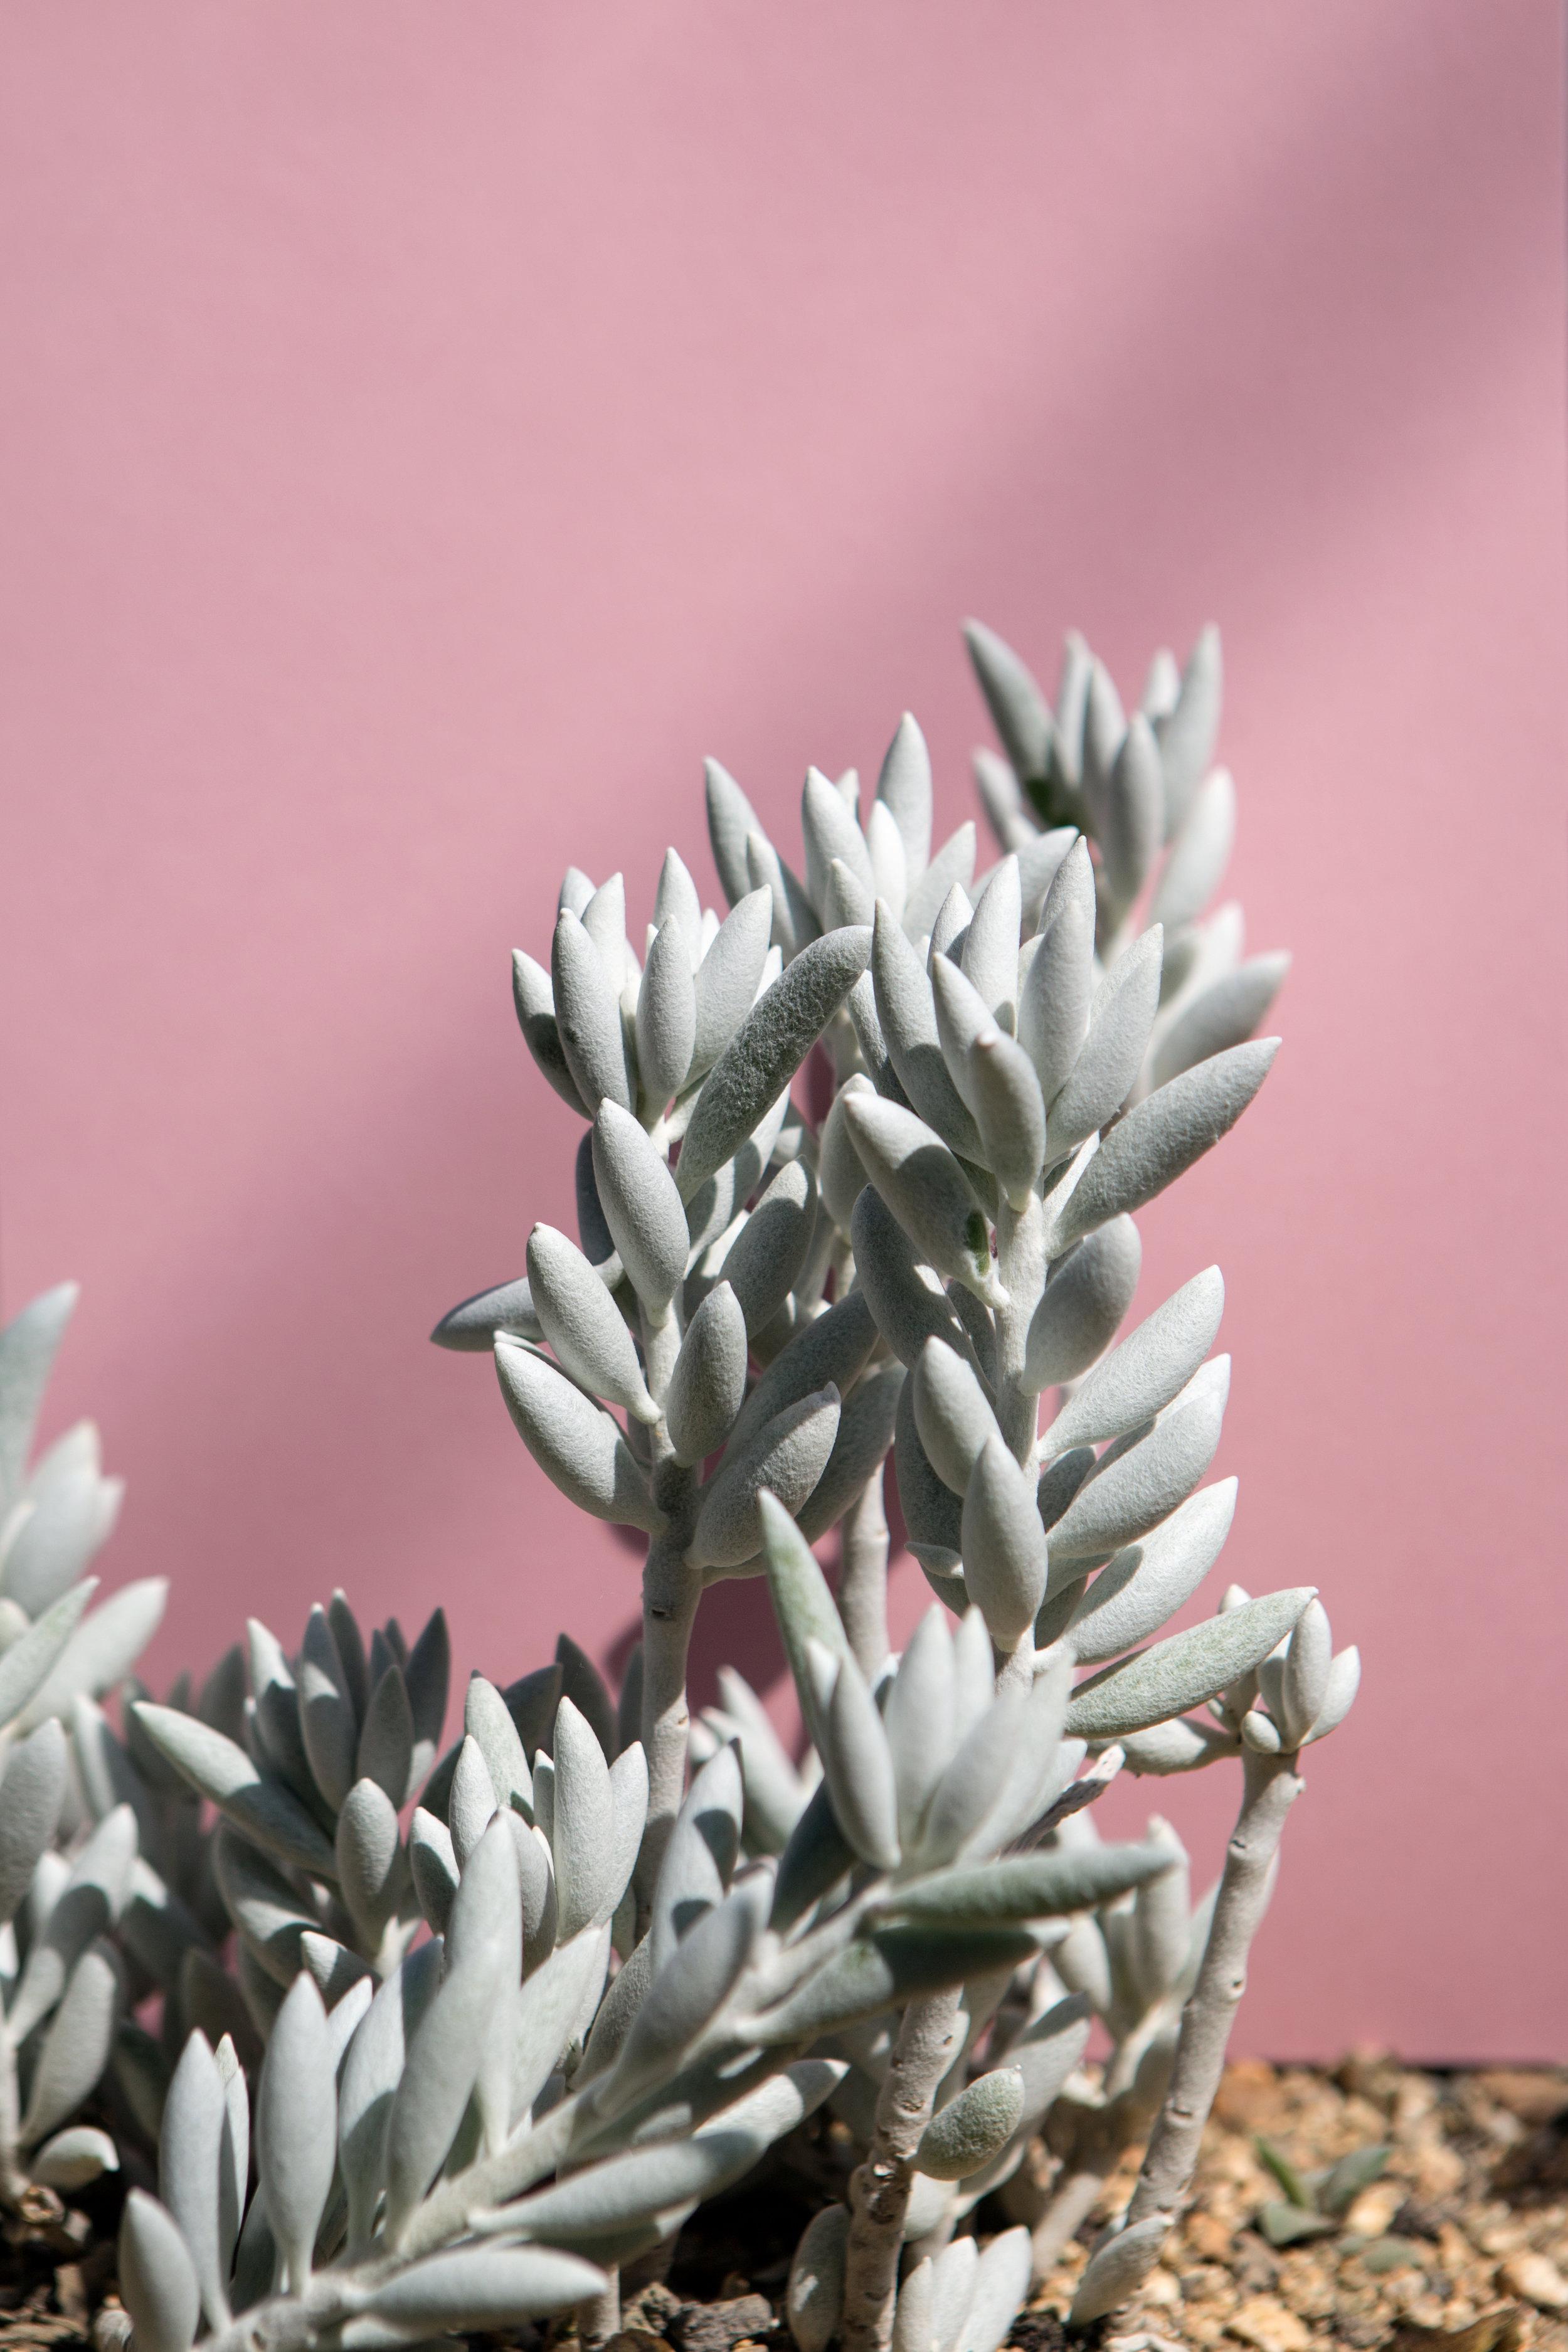 rosa_Plant_jacob_reischel1.jpg